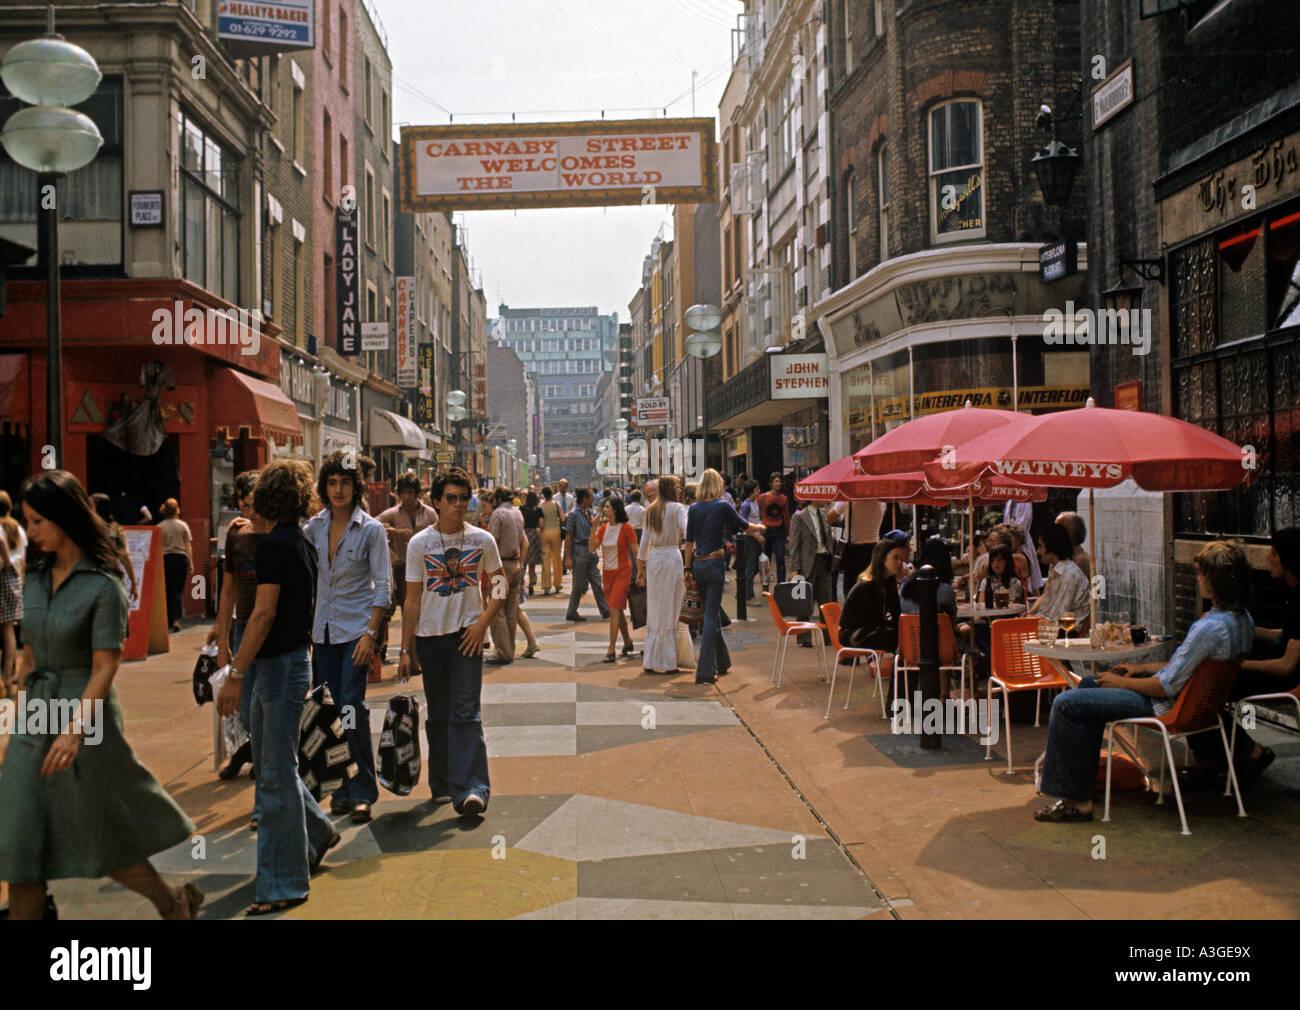 Carnaby Street 1960s - Stock Image